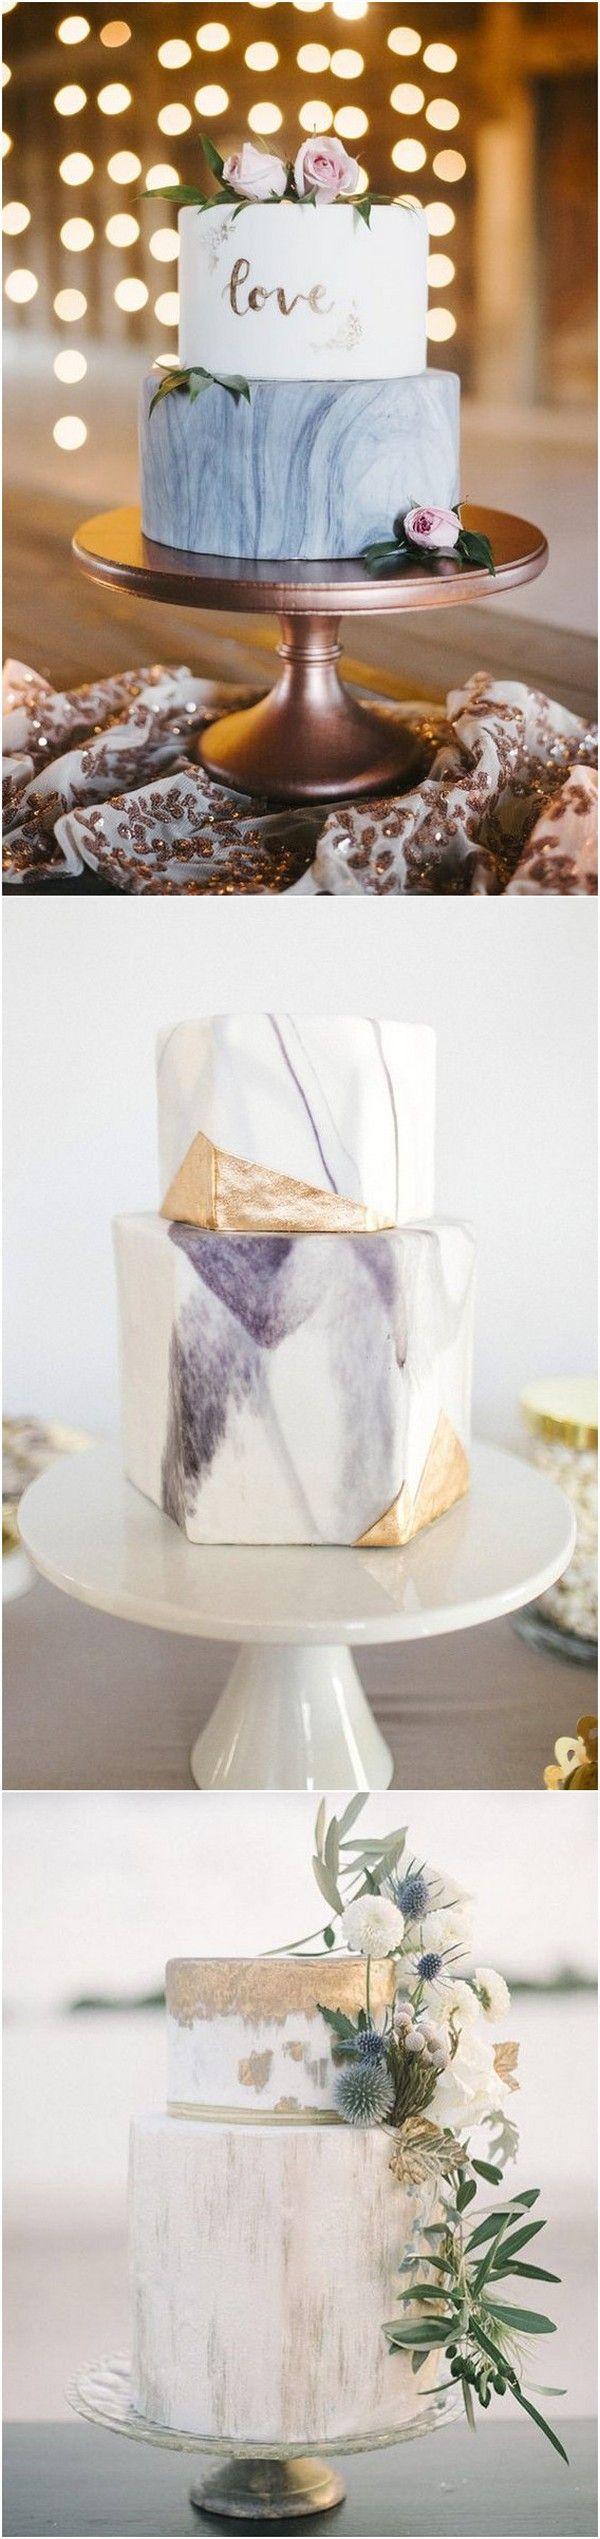 1920's wedding decorations ideas november 2018  best MRBratch images on Pinterest  Wedding ideas Hair